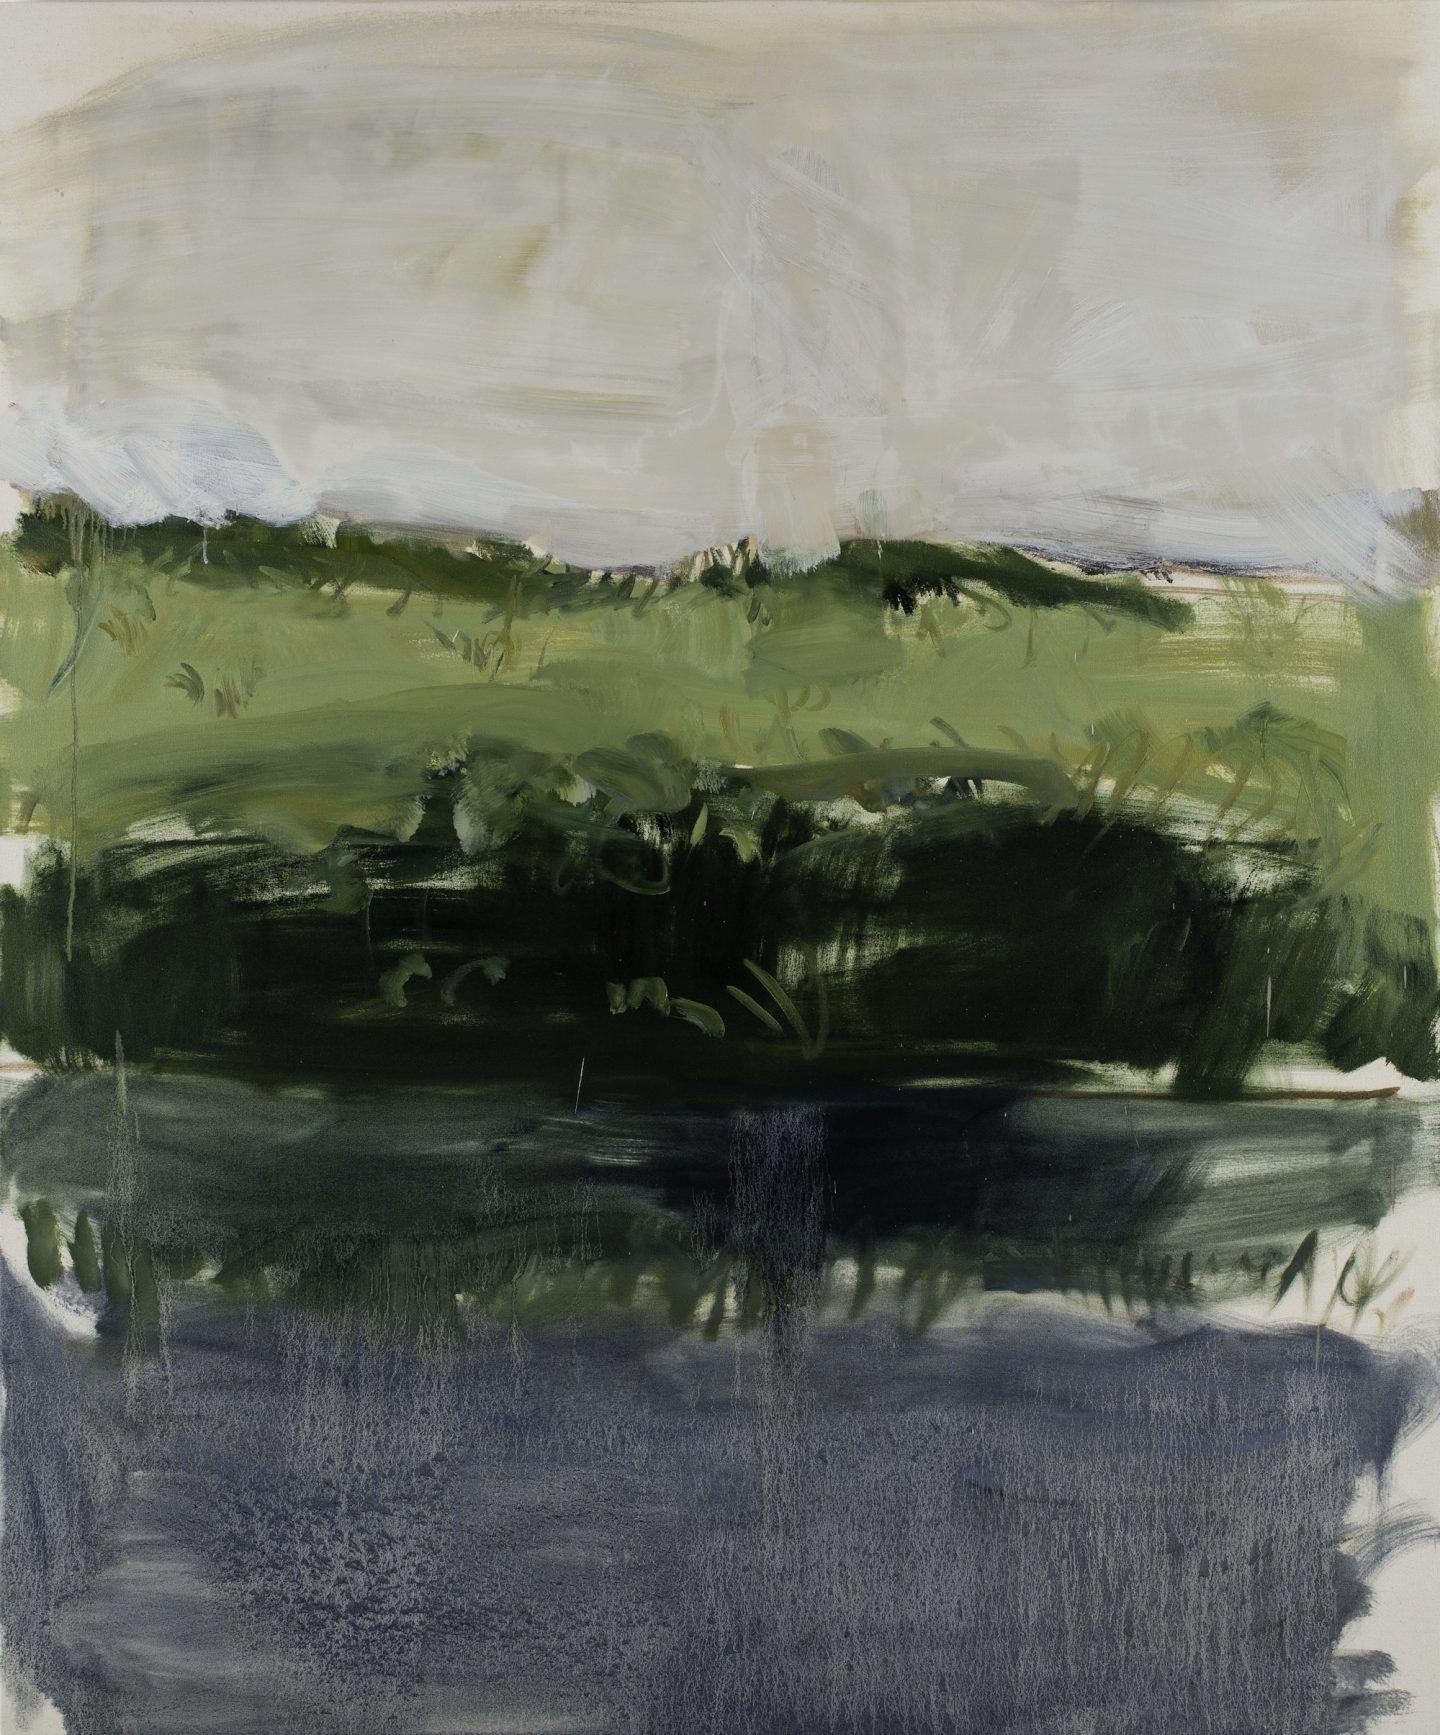 IGNANT-Art-Gideon-Rubin-15